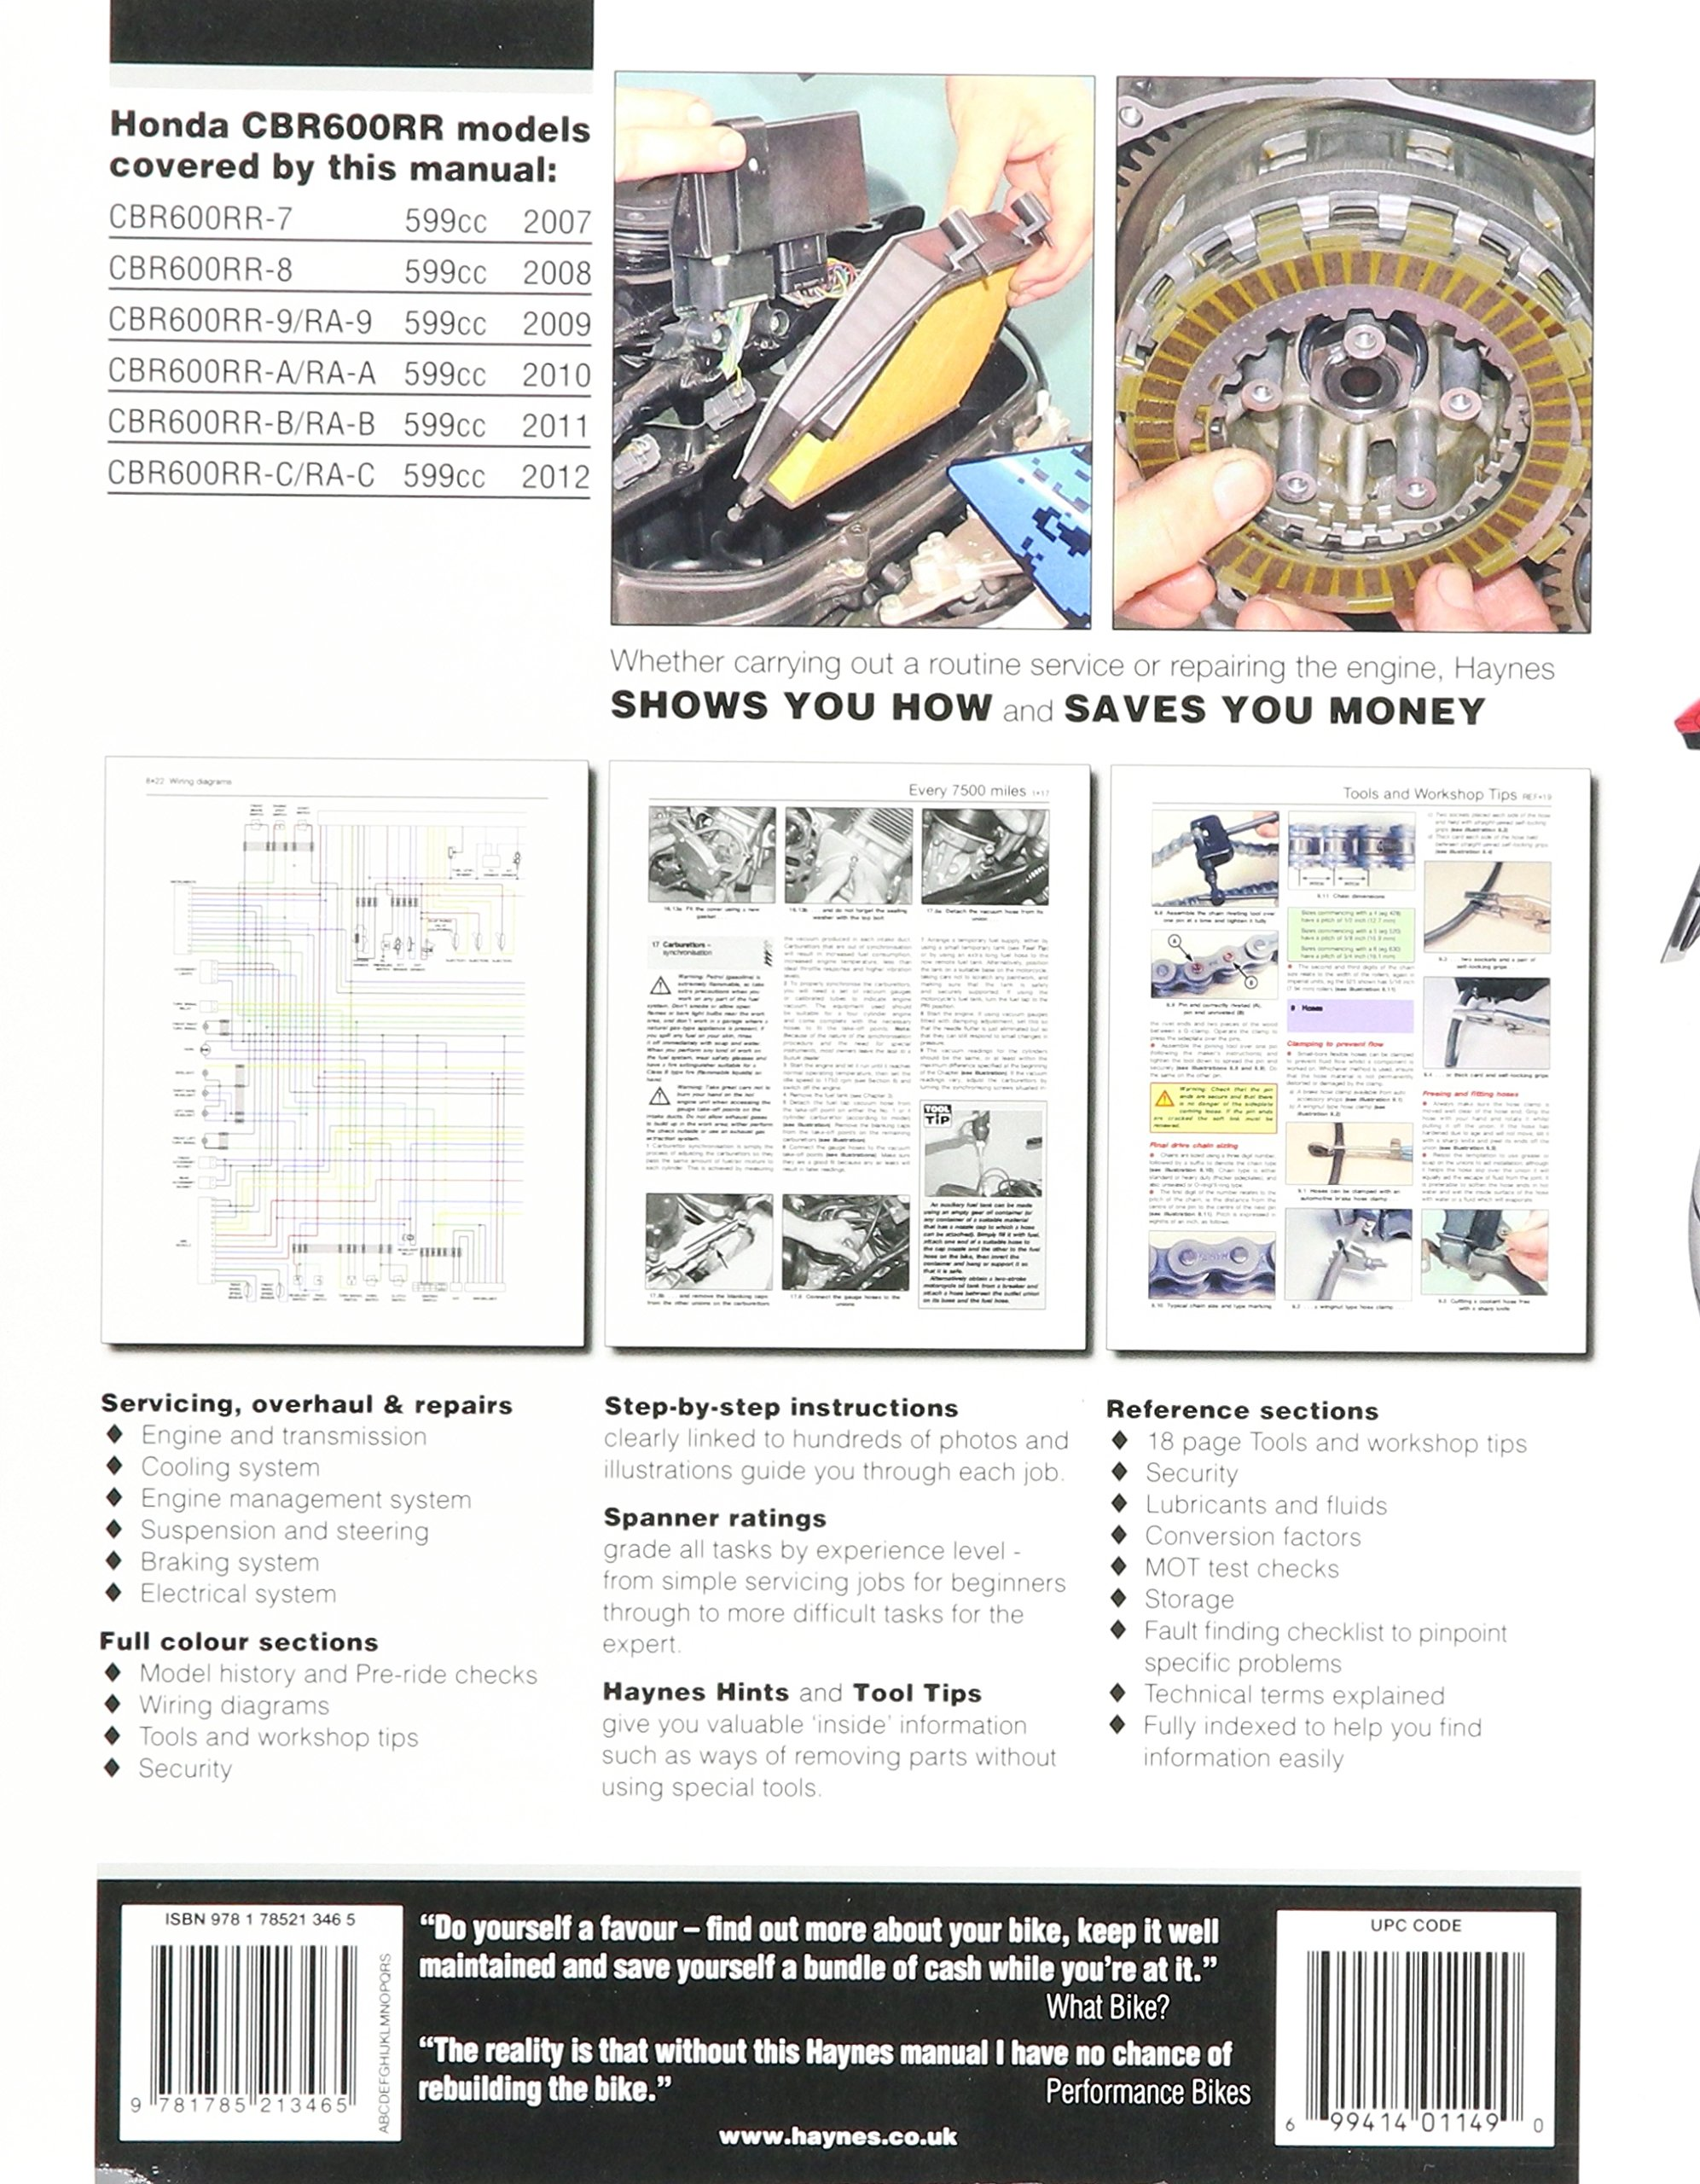 2007 Cbr600rr Wiring Diagram Trusted Schematics 2012 Cbr1000rr Honda 07 12 Haynes Powersport Publishing Hayabusa